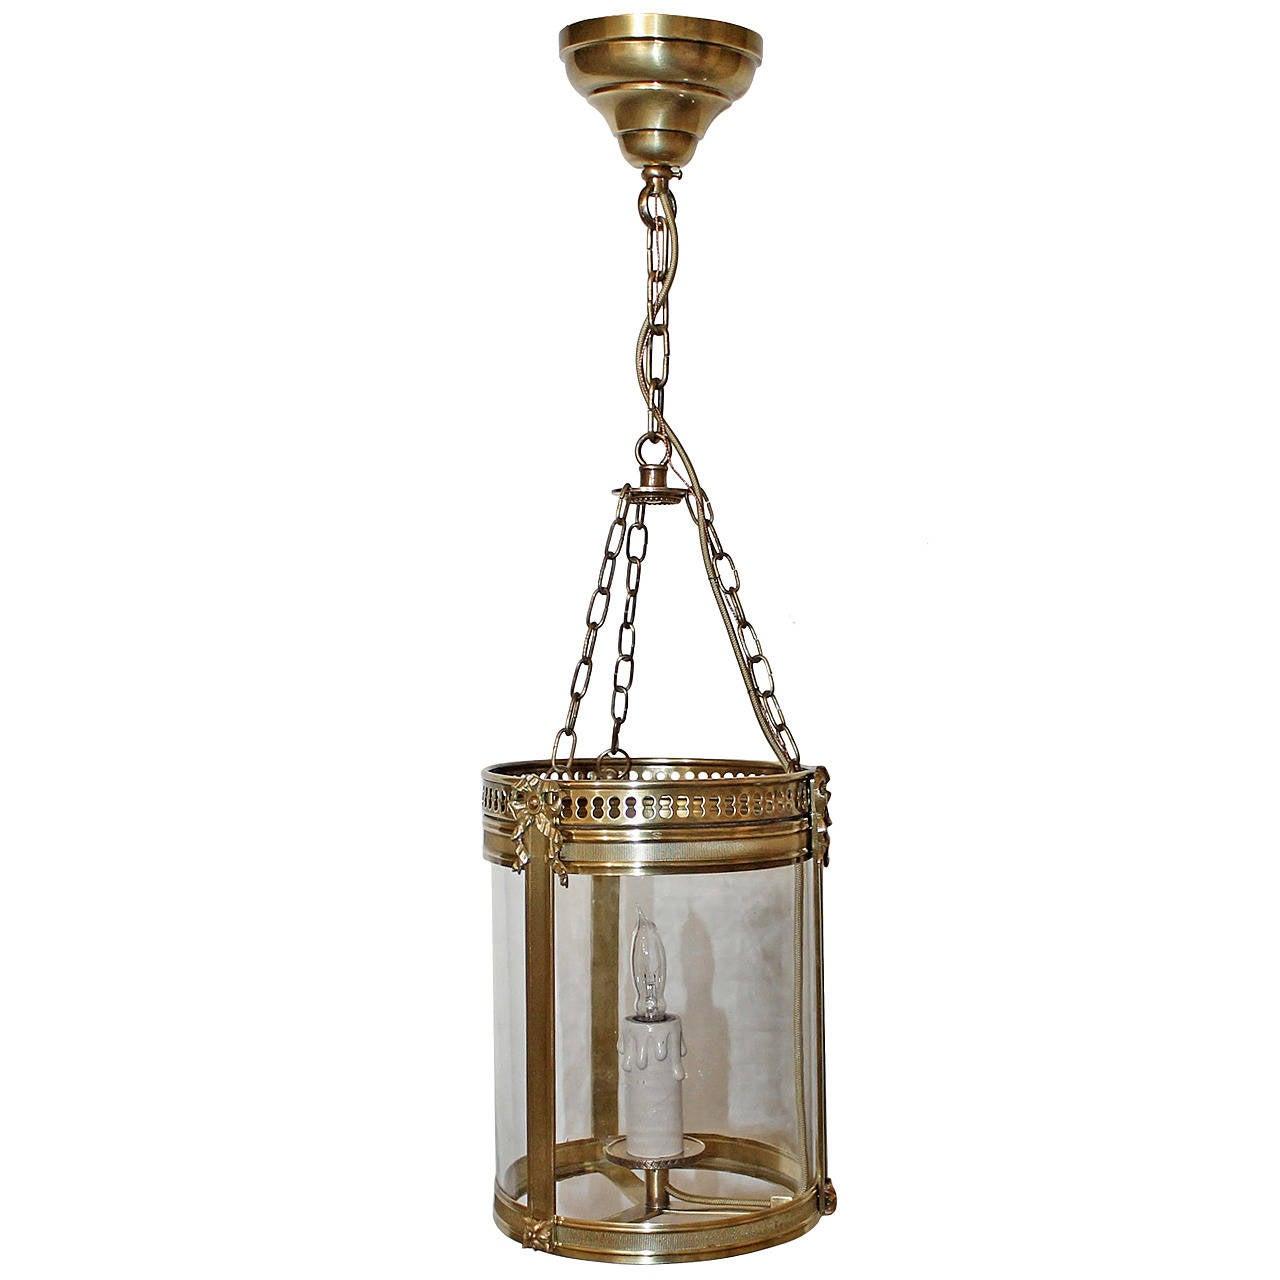 Diminutive french brass lantern pendant light for sale at 1stdibs diminutive french brass lantern pendant light 1 arubaitofo Images